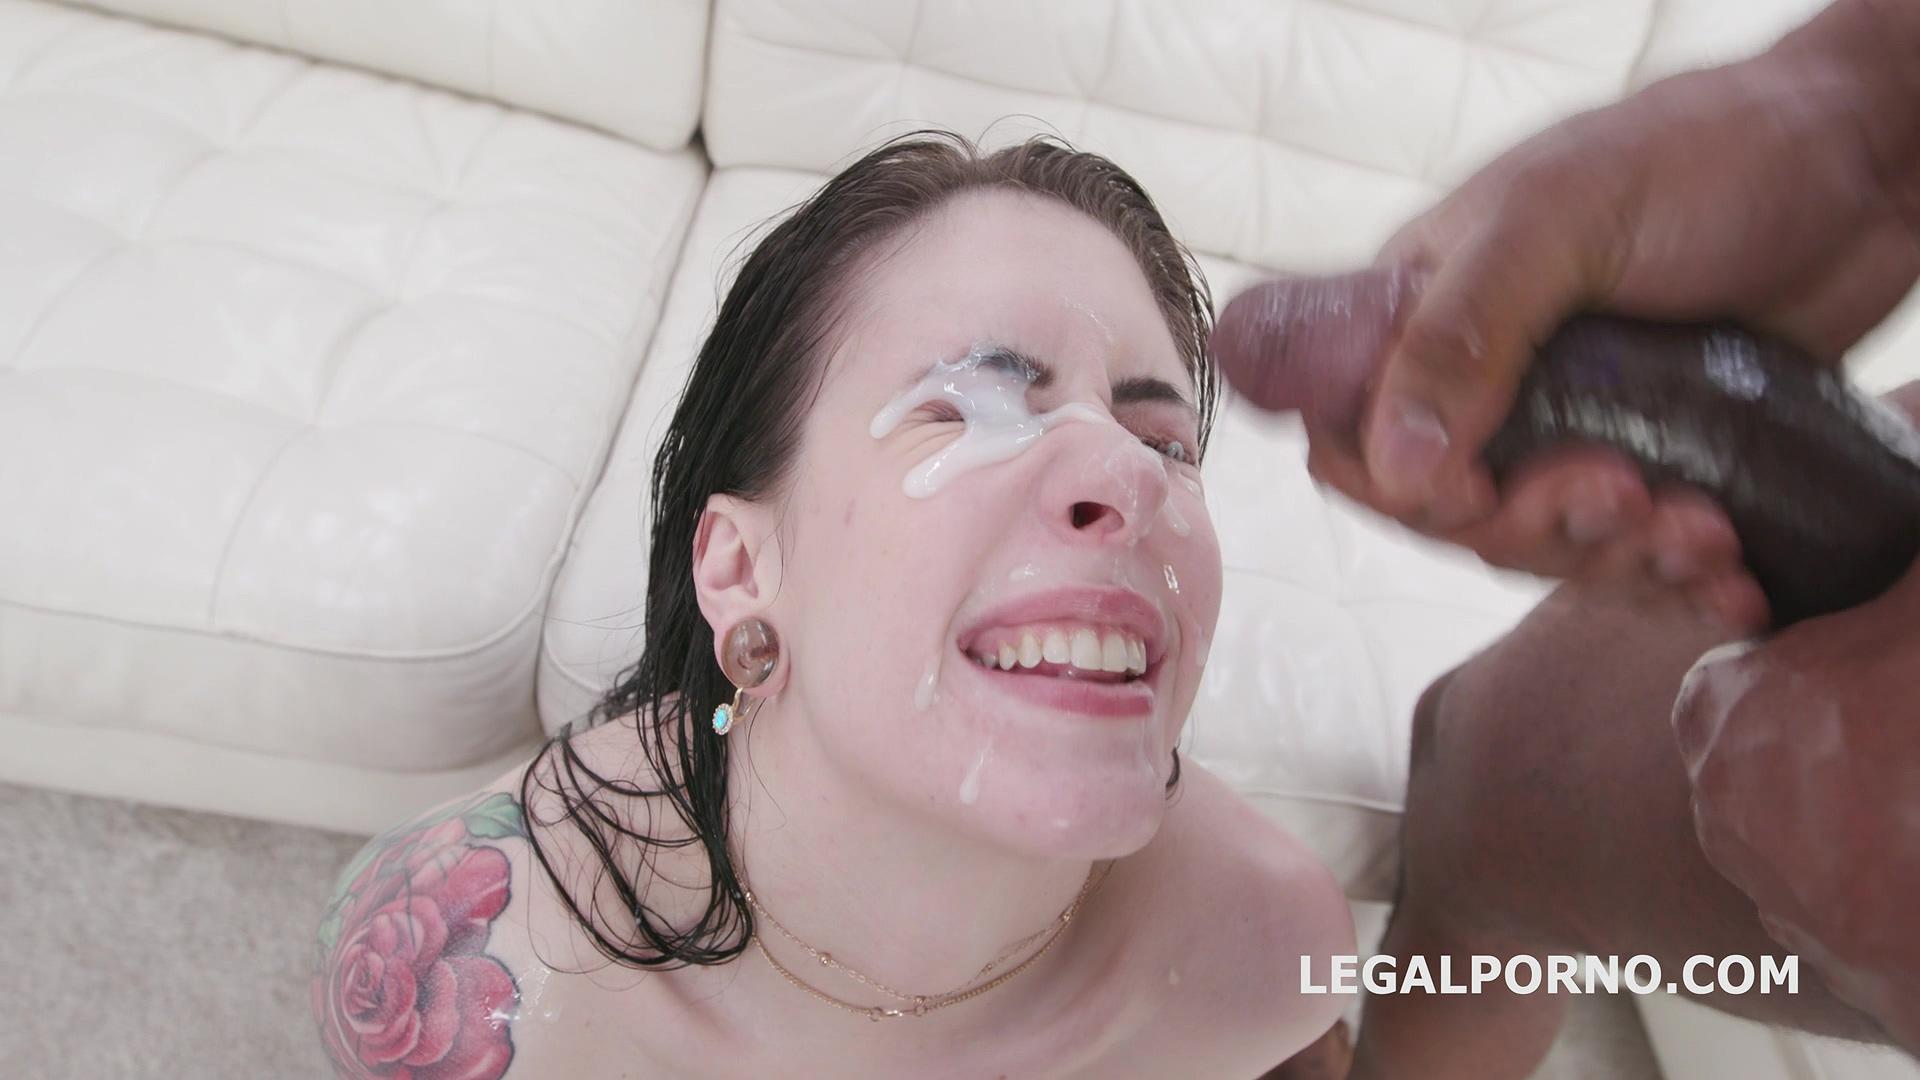 anna_de_ville_is_indestructible_2_balls_deep_anal_dap_gapes_facial_gio1305_fhd_mp4_20200303_135205_891.jpg